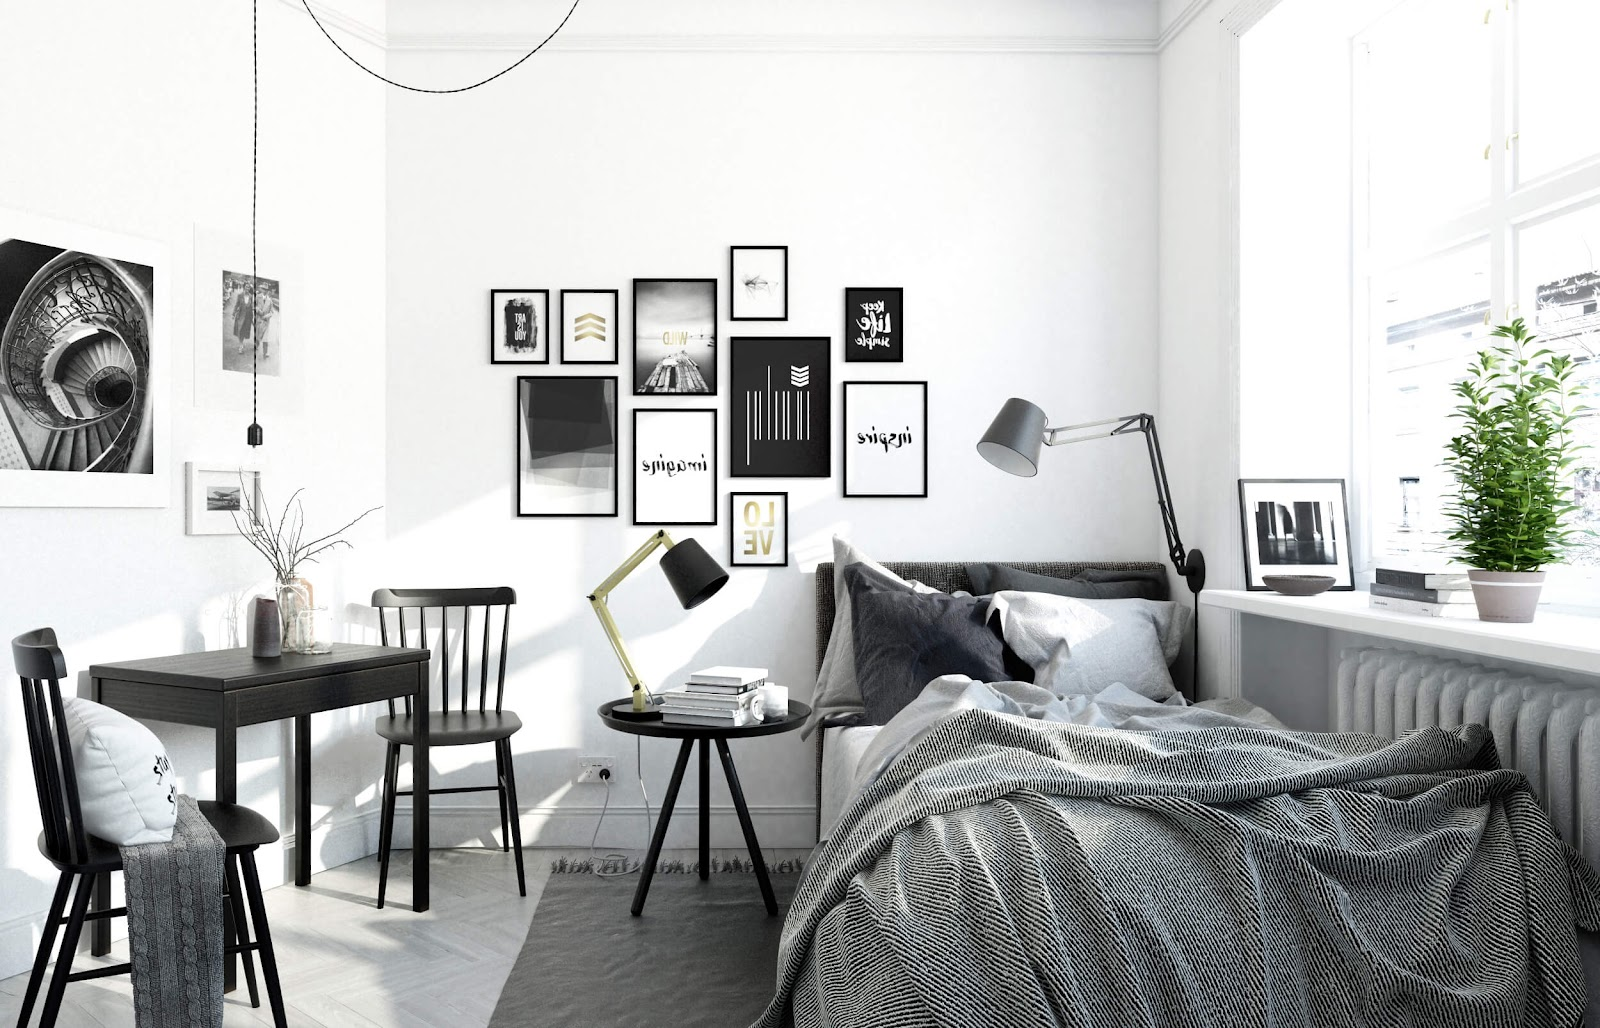 Dekorasi pajangan dinding hitam putih pada kamar tidur Scandinavian - source: nonagon.style